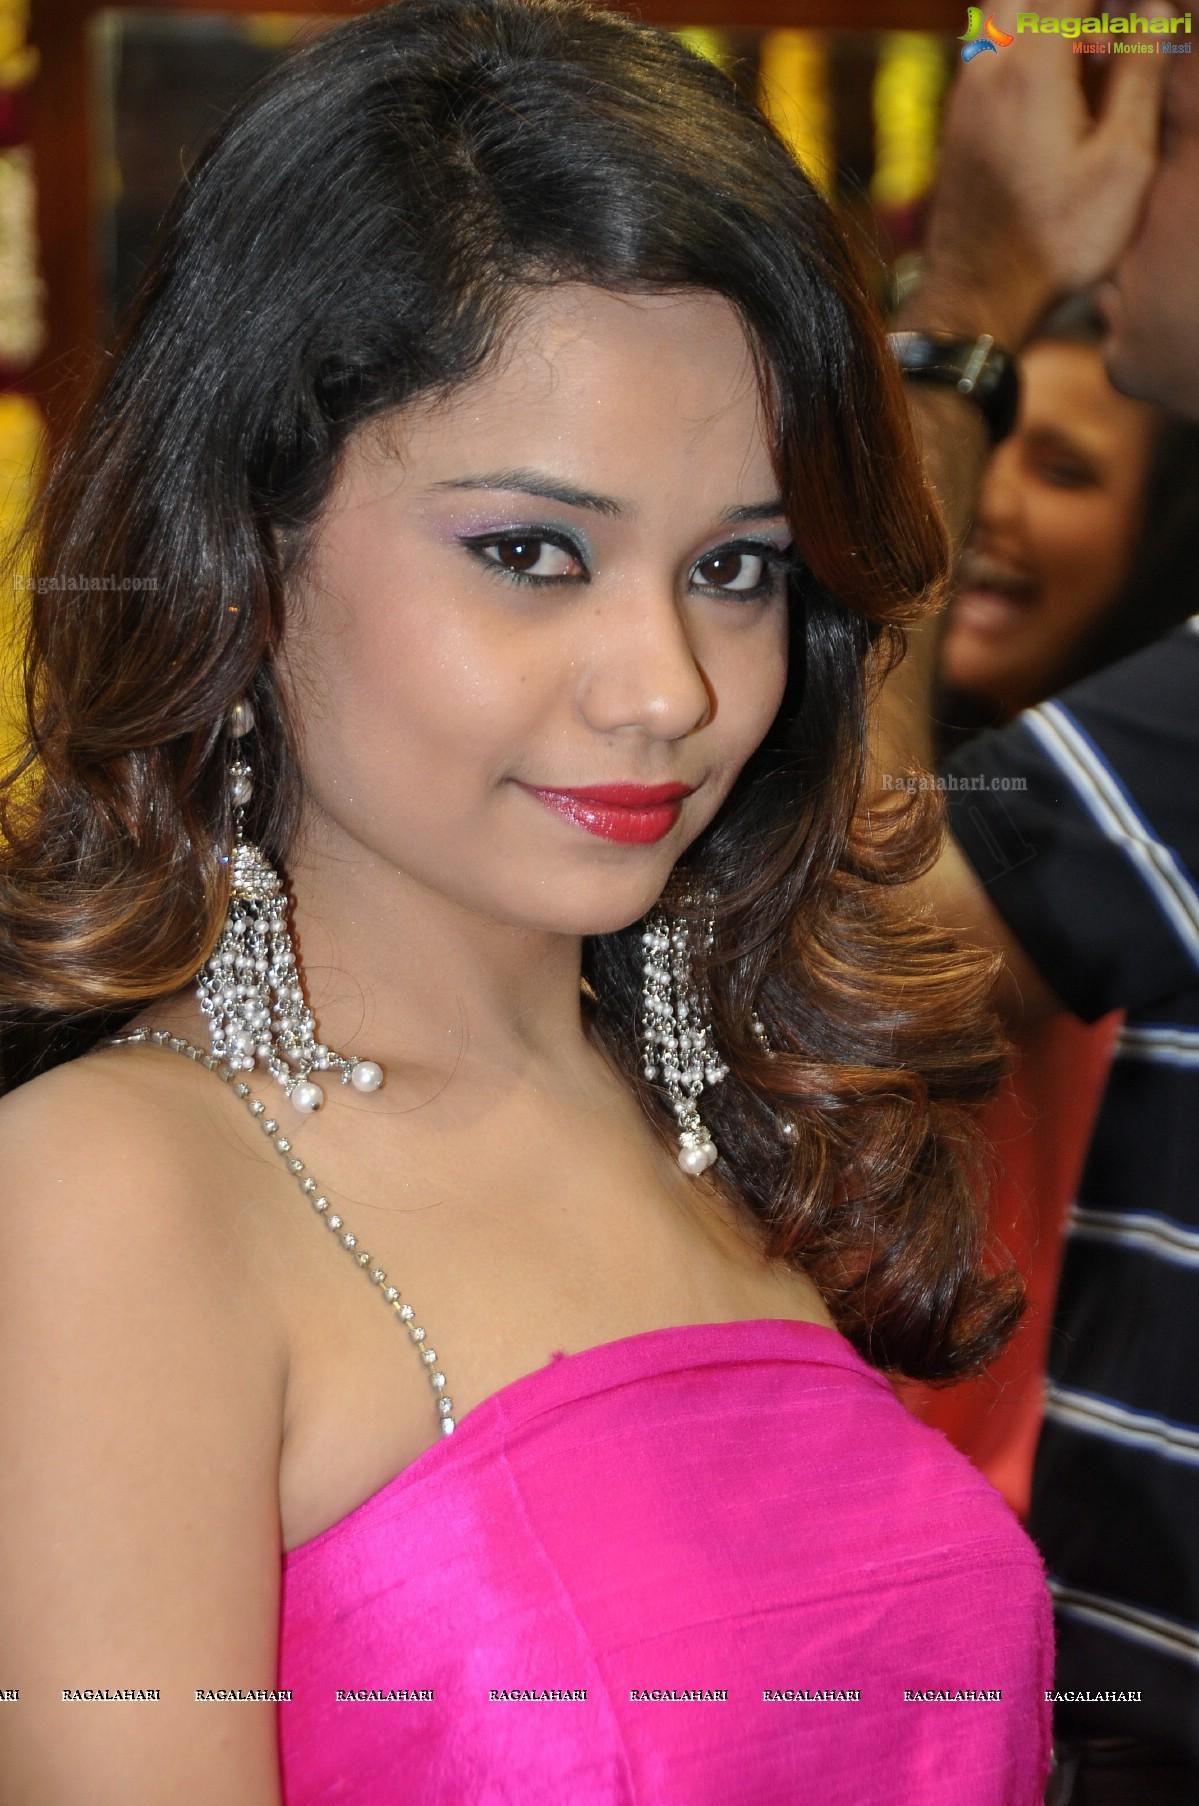 Fathima sexy